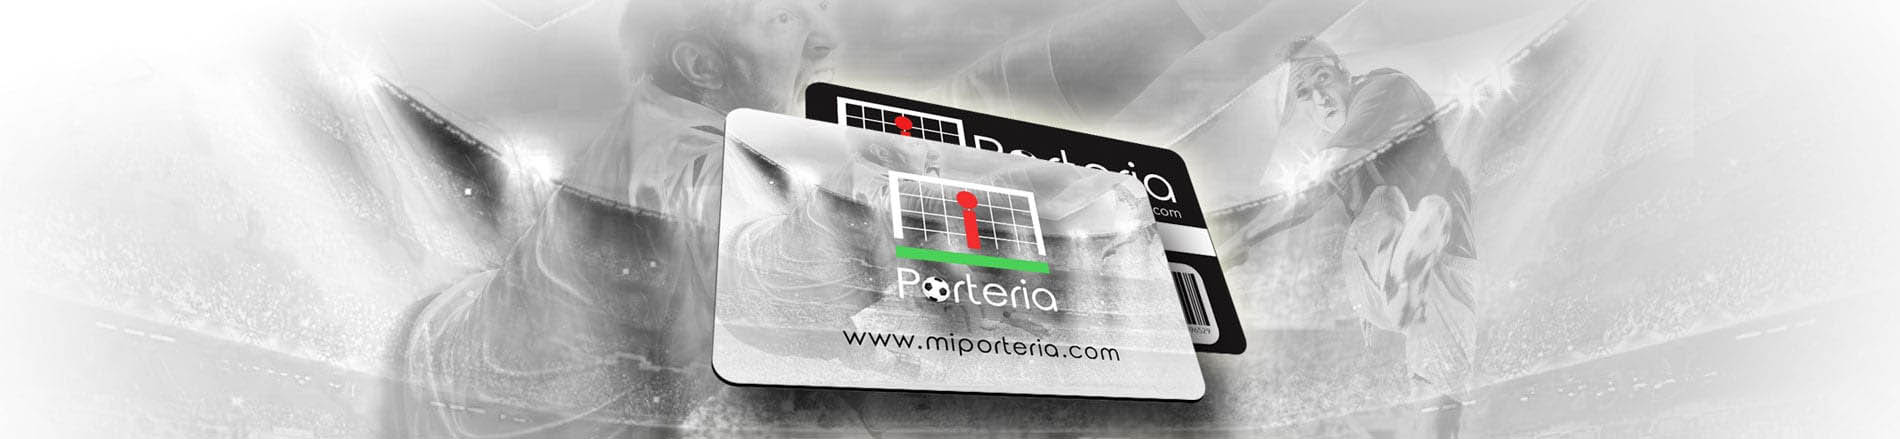 miporteria-offer